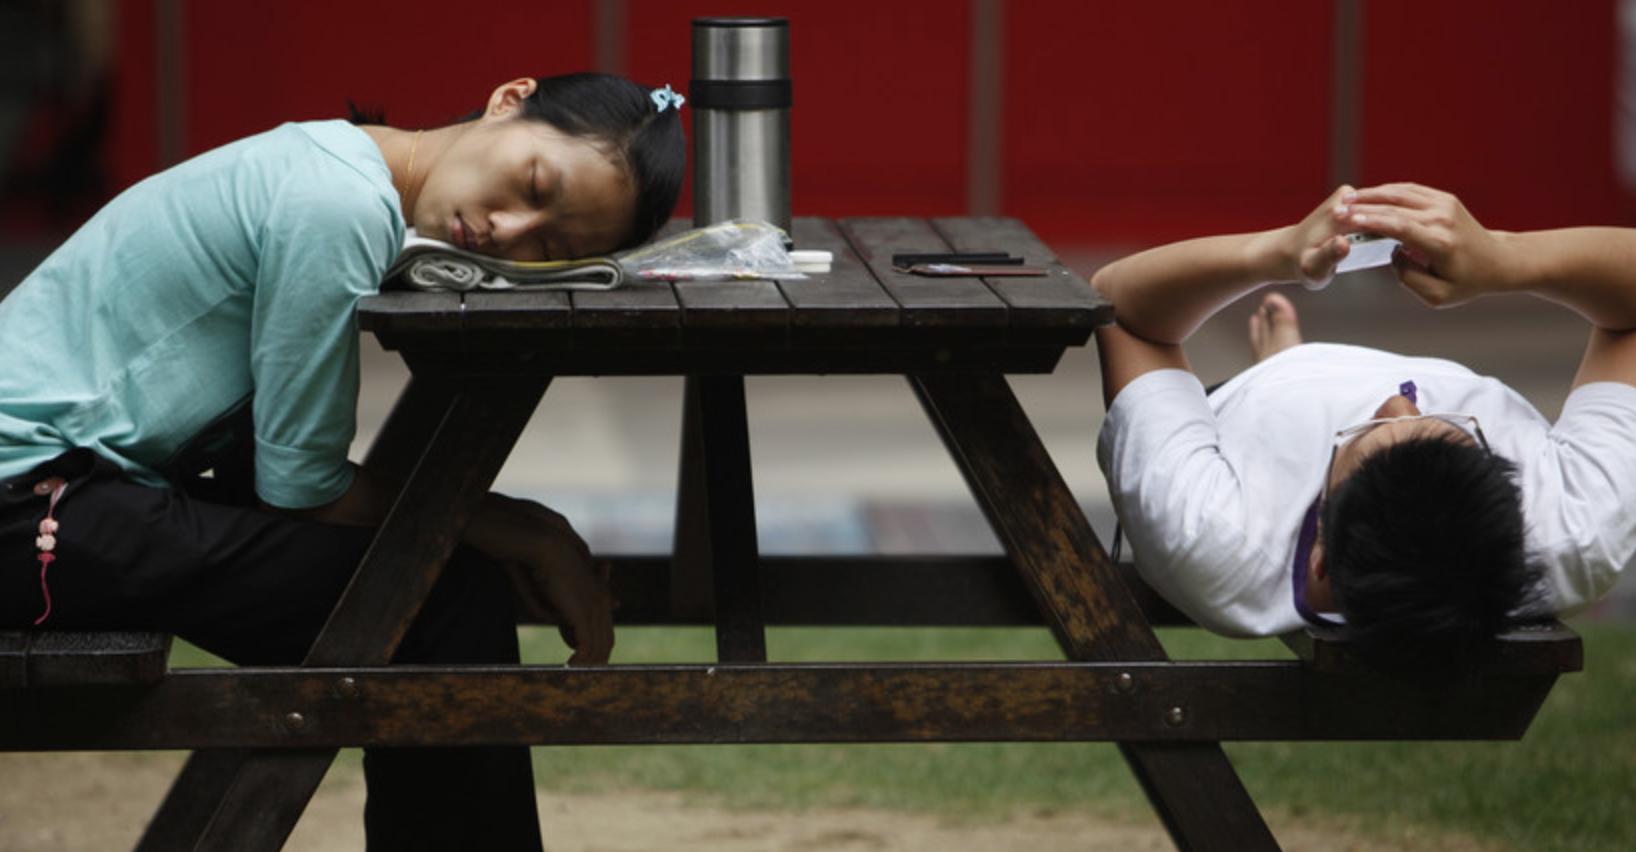 How a good night's sleep can 'clean' your brain